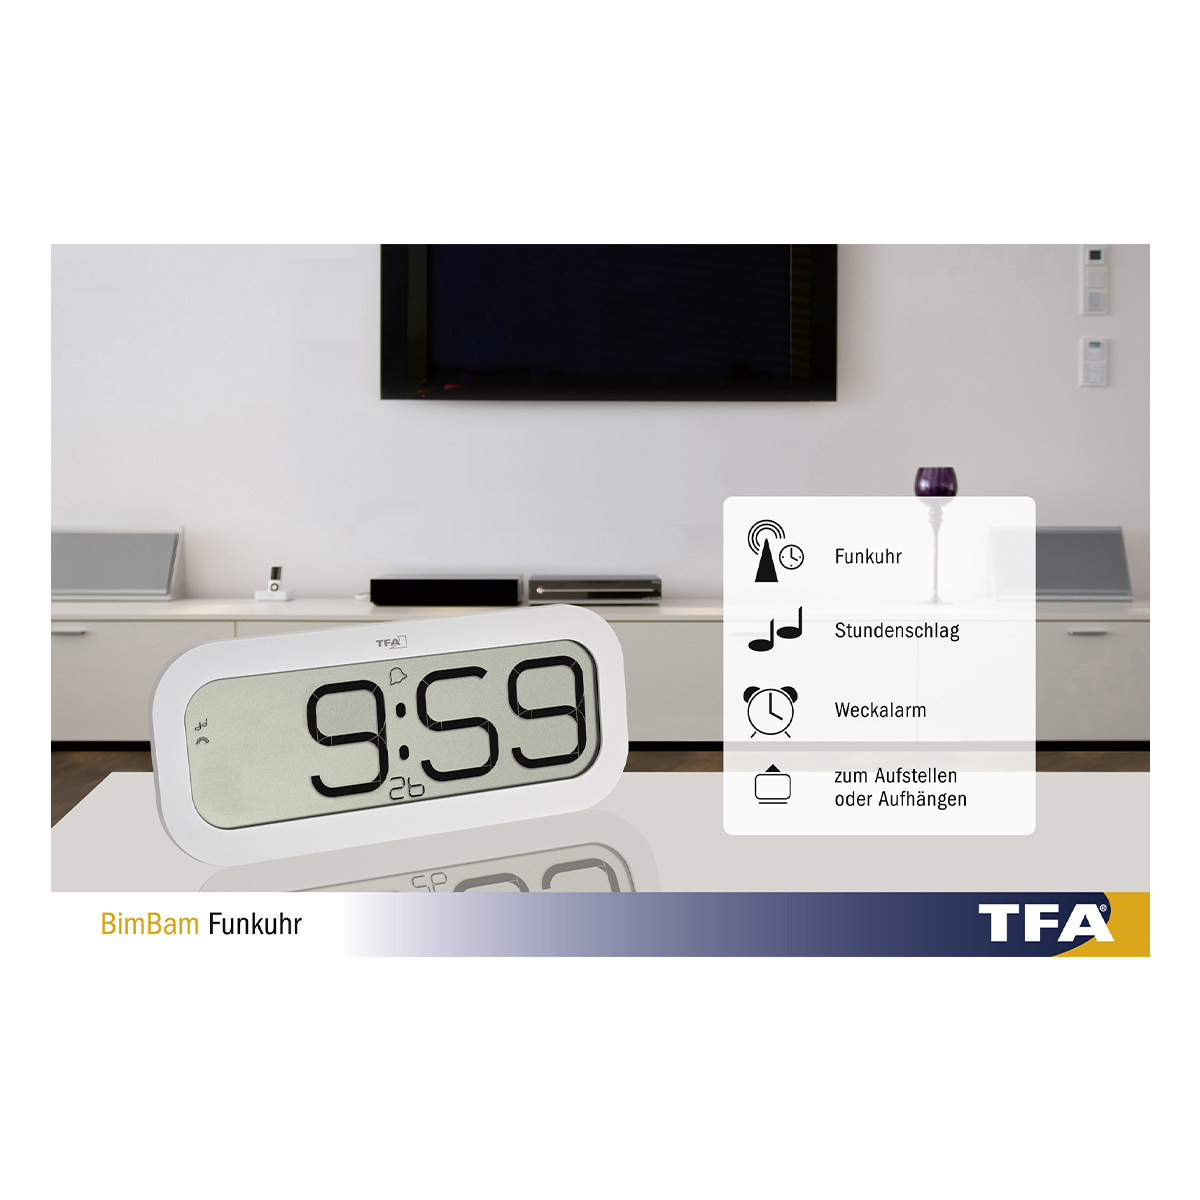 60-4514-02-digitale-funkuhr-mit-stundenschlag-bimbam-icons-1200x1200px.jpg